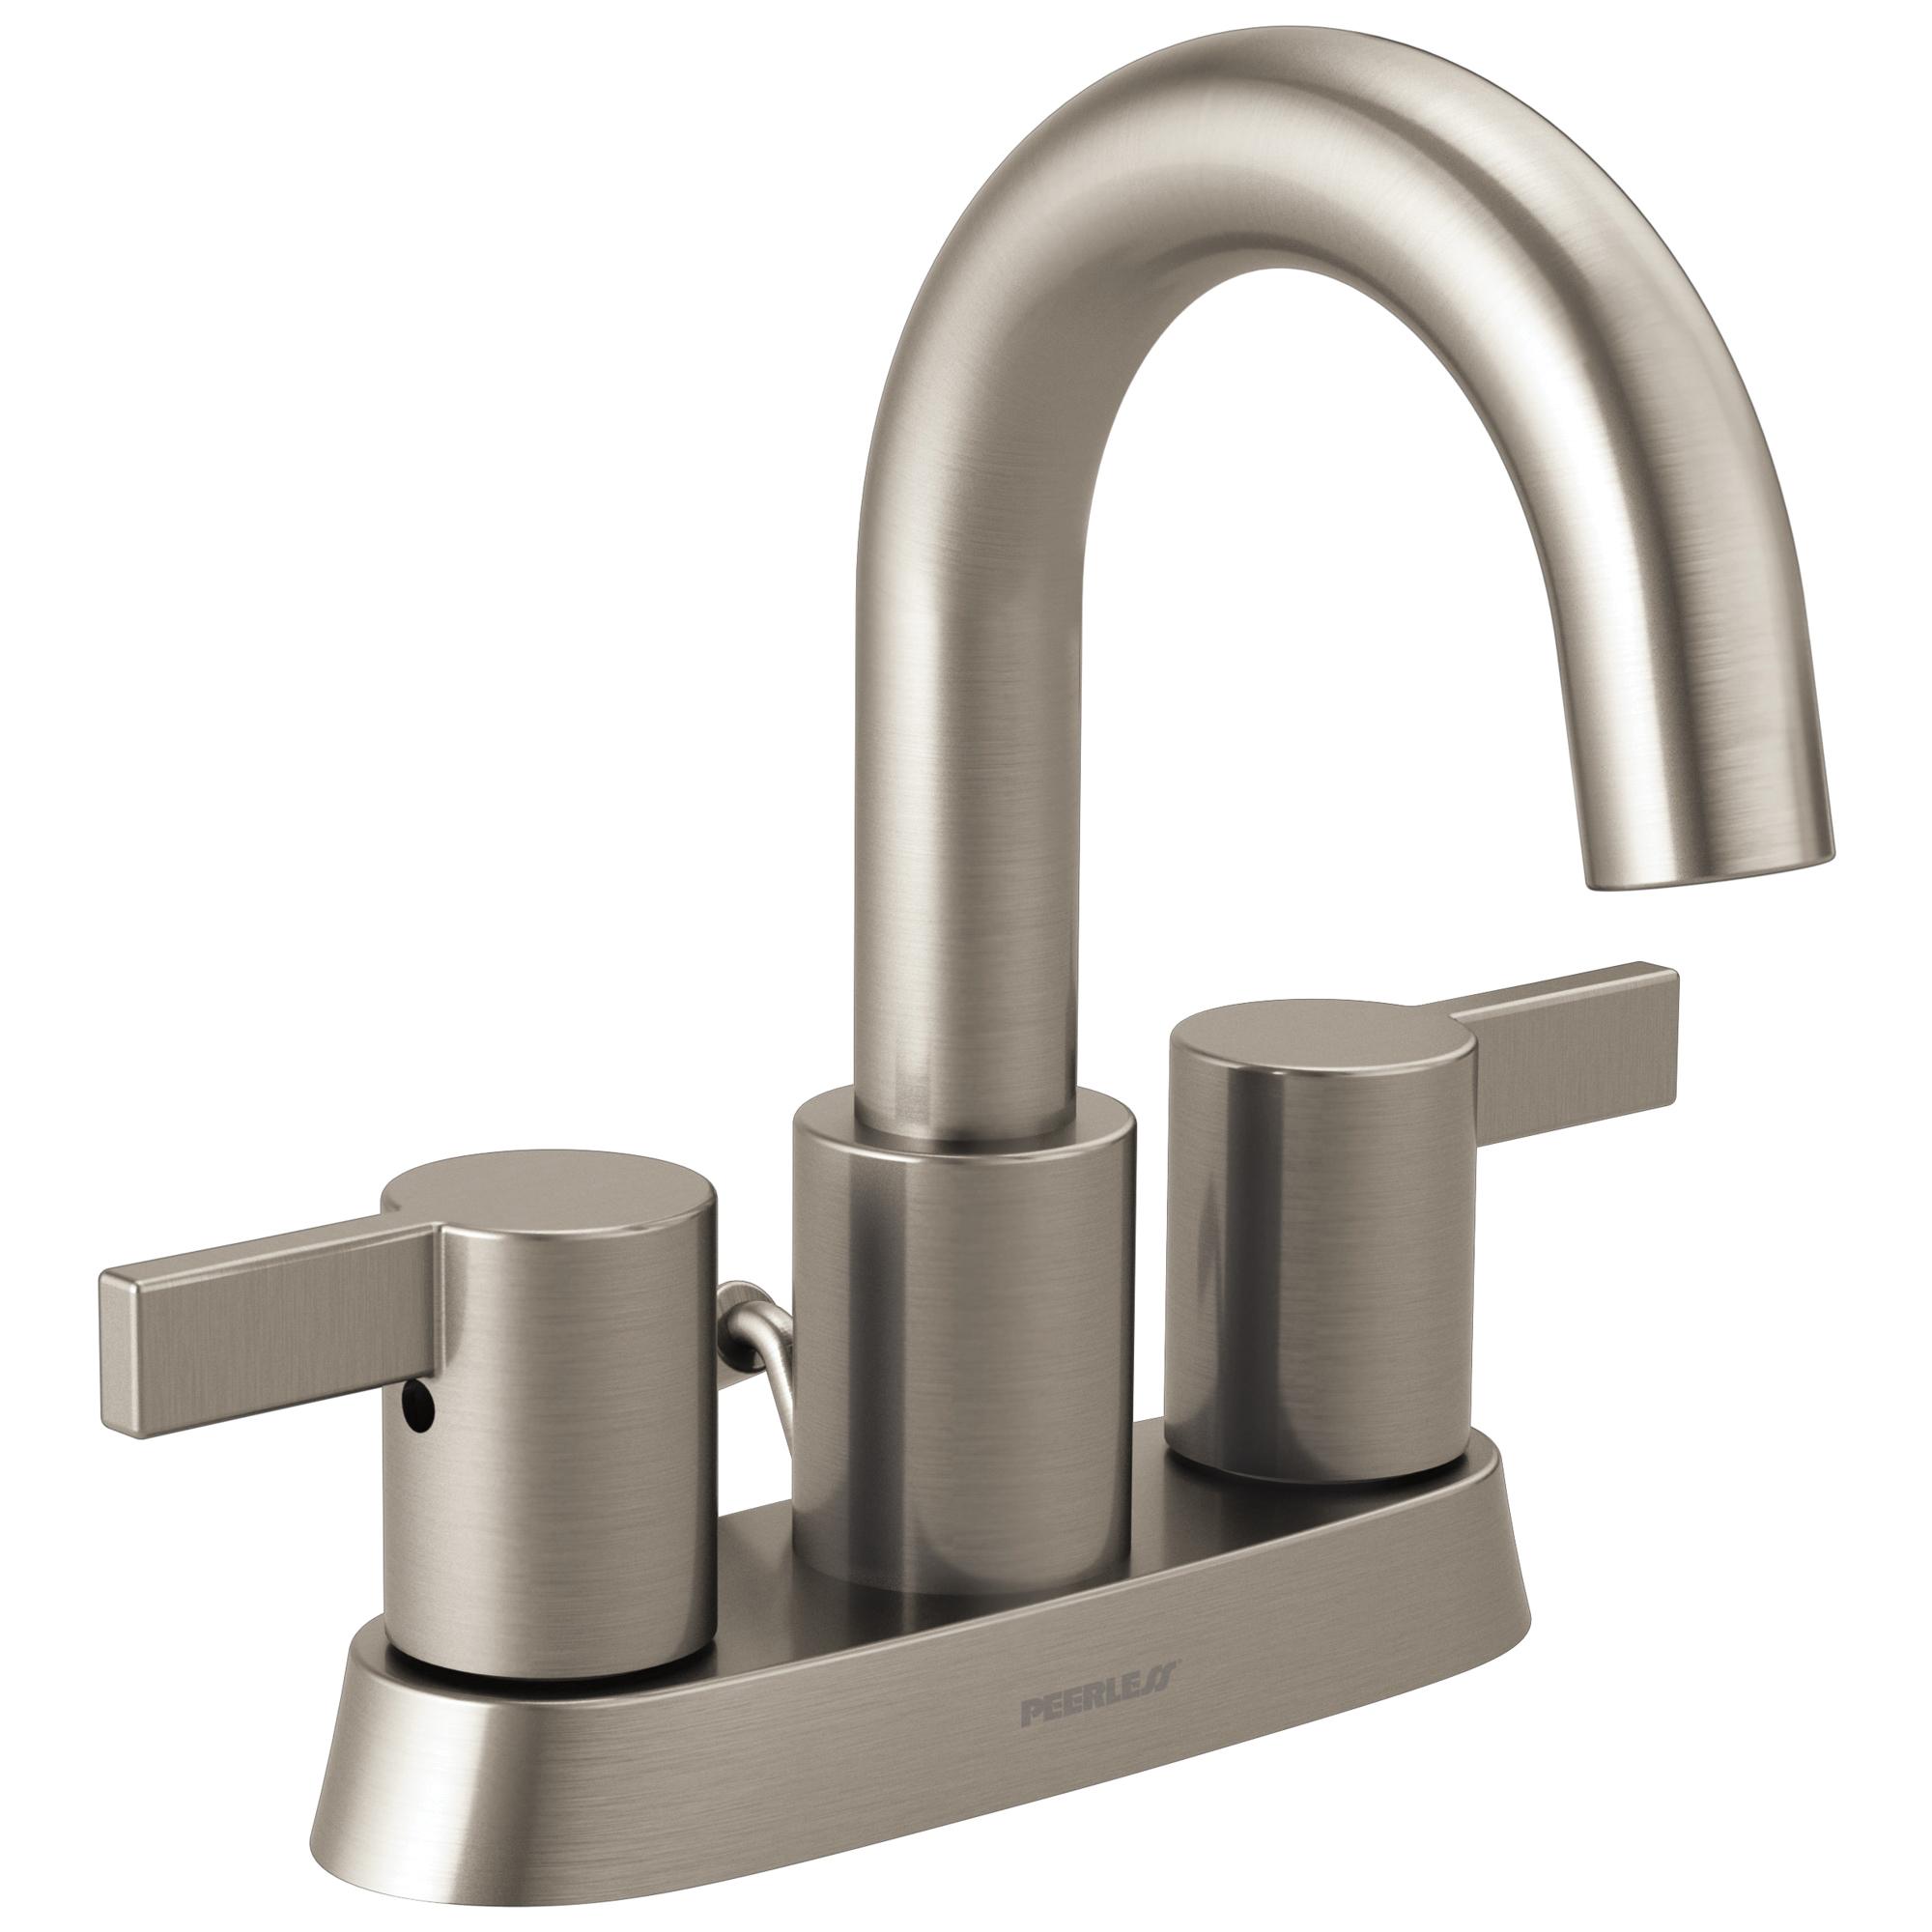 Peerless® P299102LF-BN Centerset Lavatory Faucet, Apex, Brushed Nickel, 2 Handles, 50/50 Pop-Up Drain, 1.2 gpm